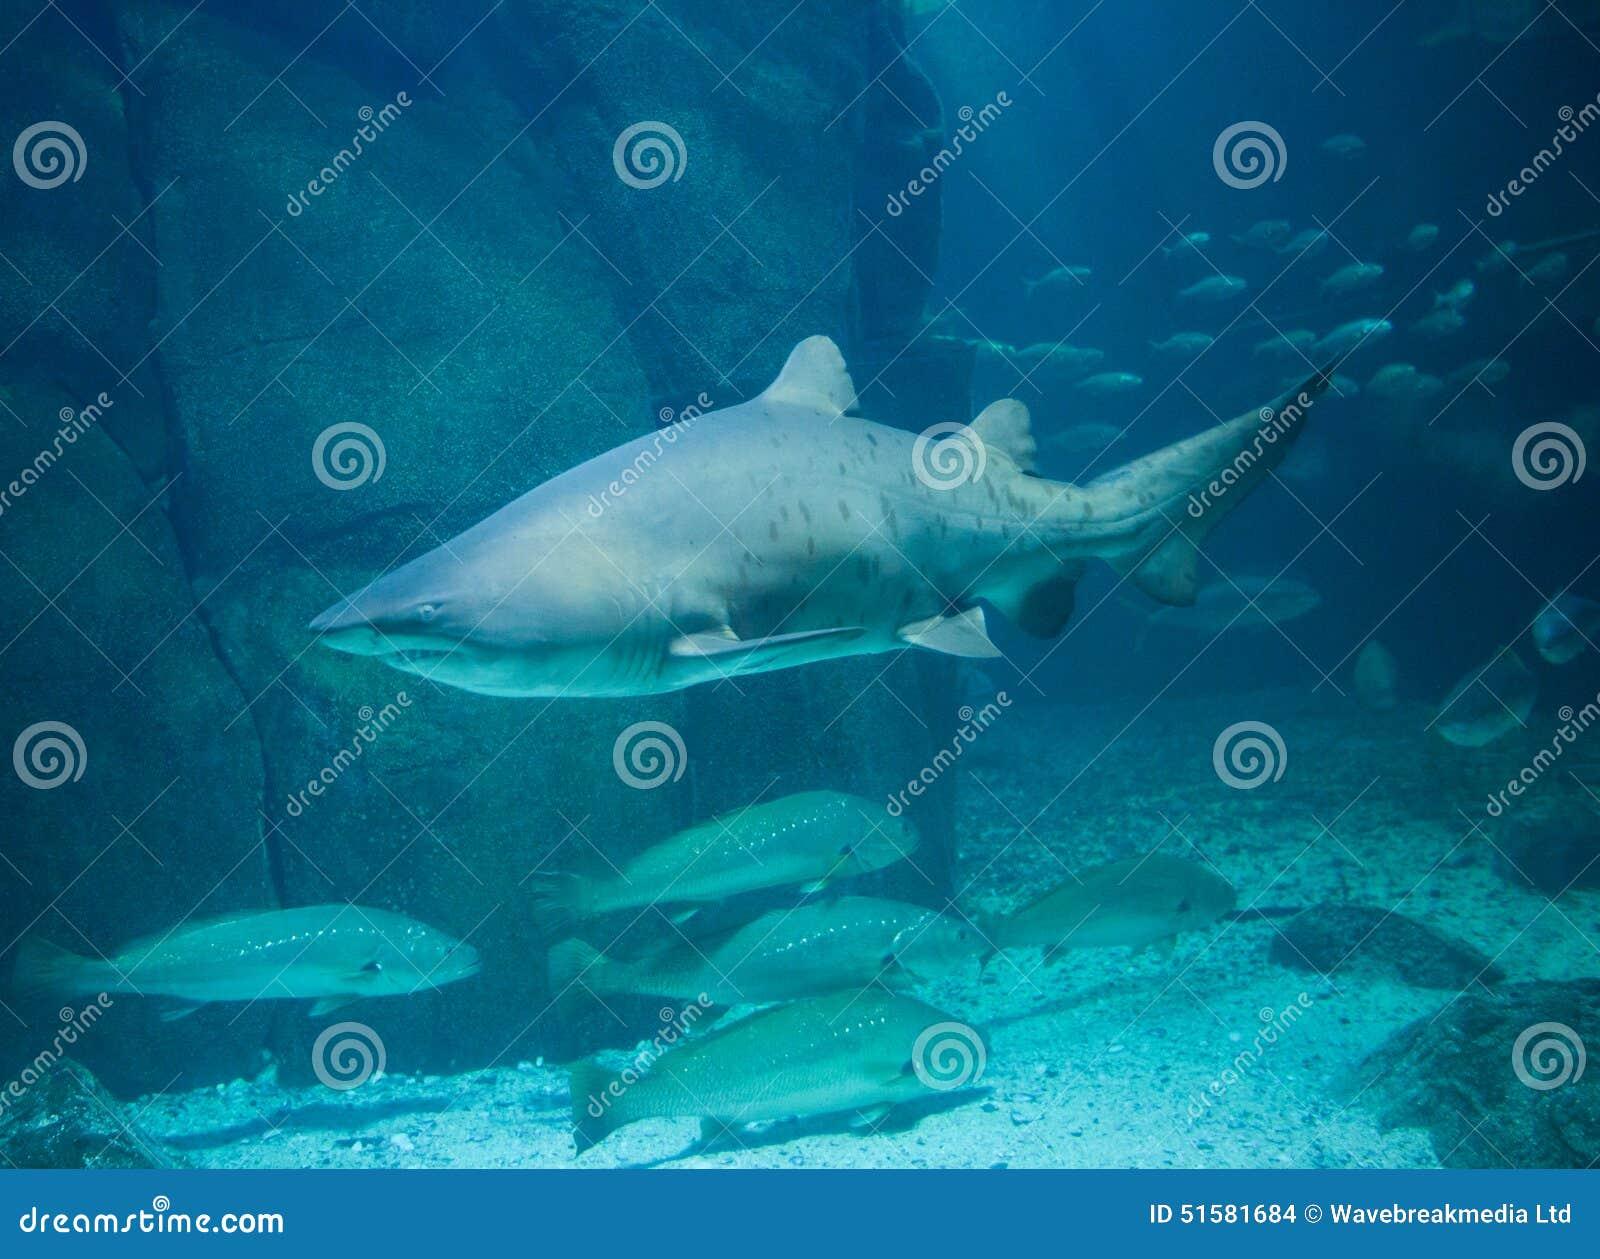 Fish in tank swimming - Shark Swimming In Fish Tank